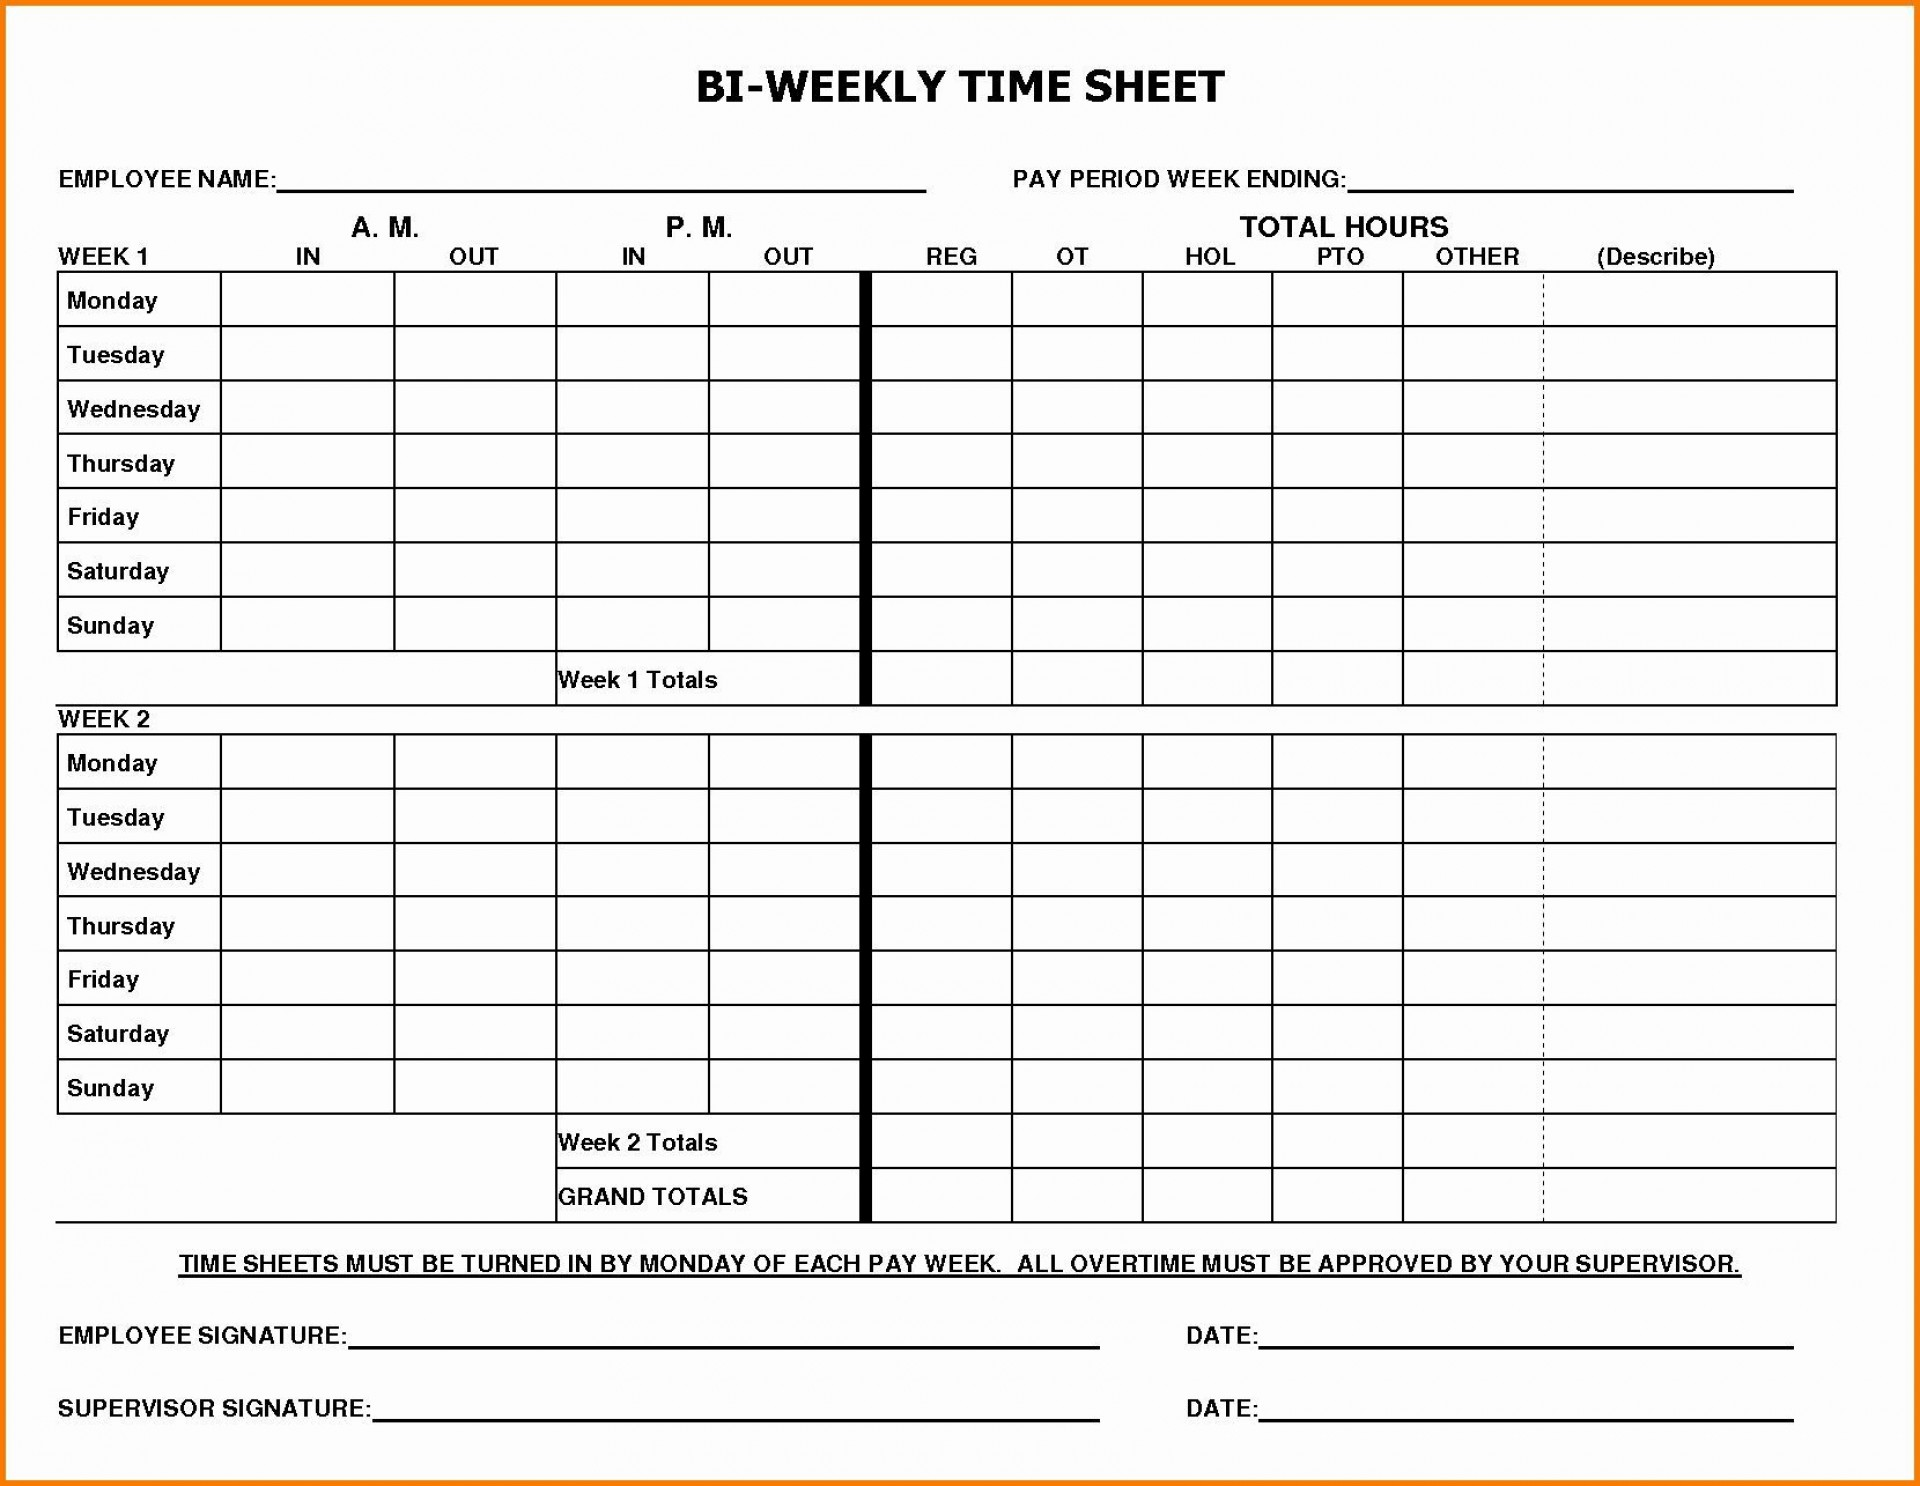 003 Rare Free Biweekly Timesheet Template Excel High Resolution 1920